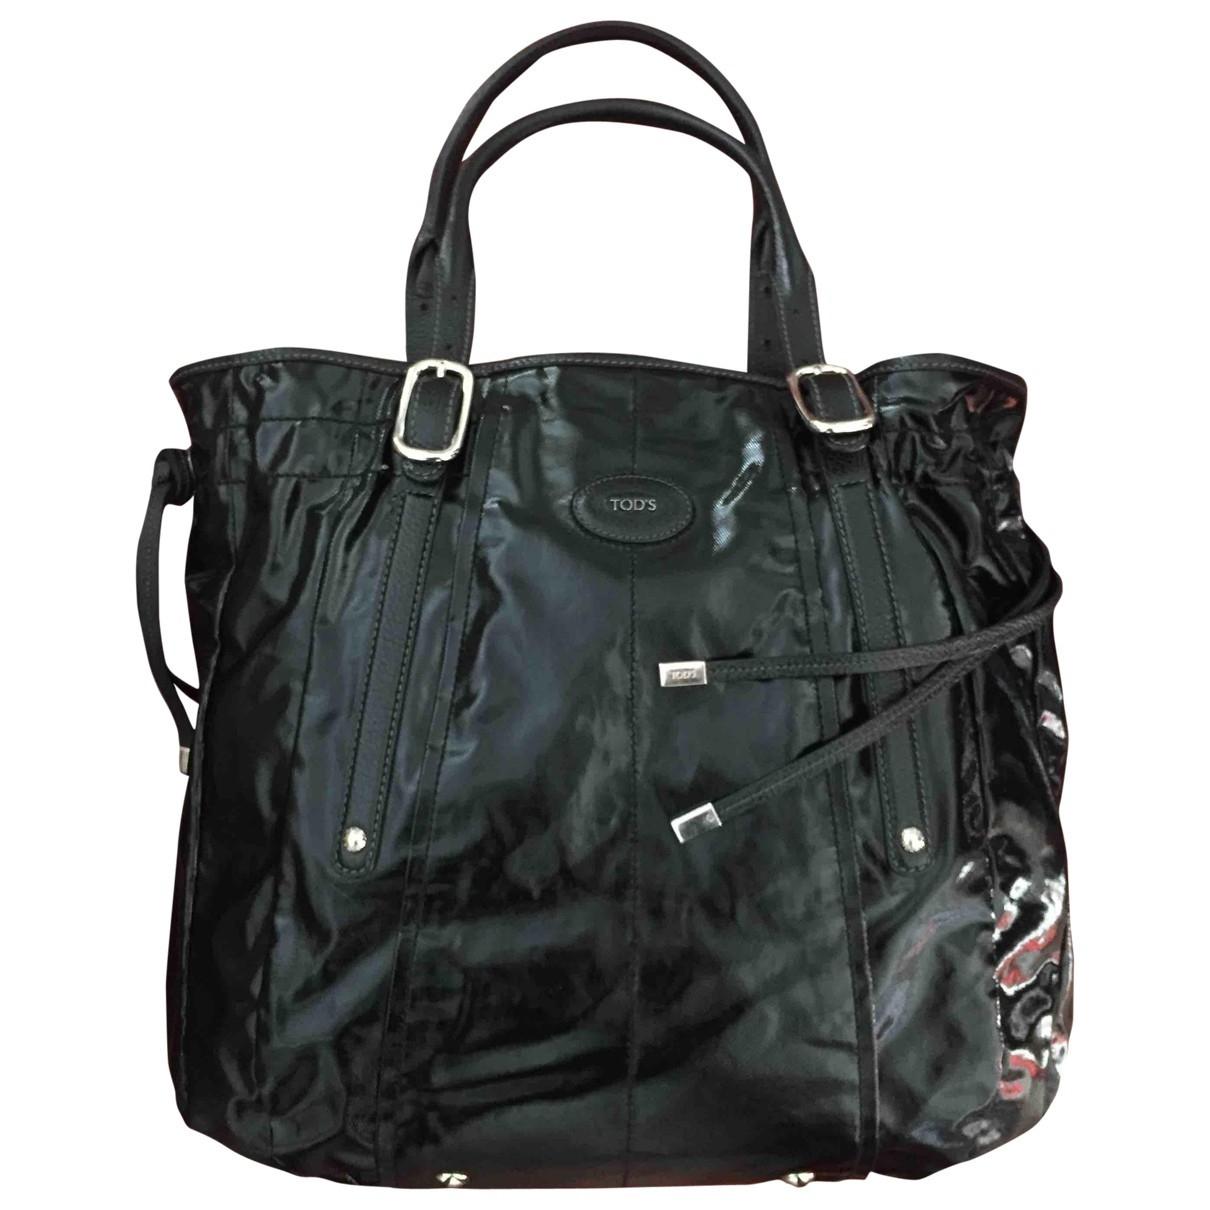 Tods \N Handtasche in  Schwarz Lackleder